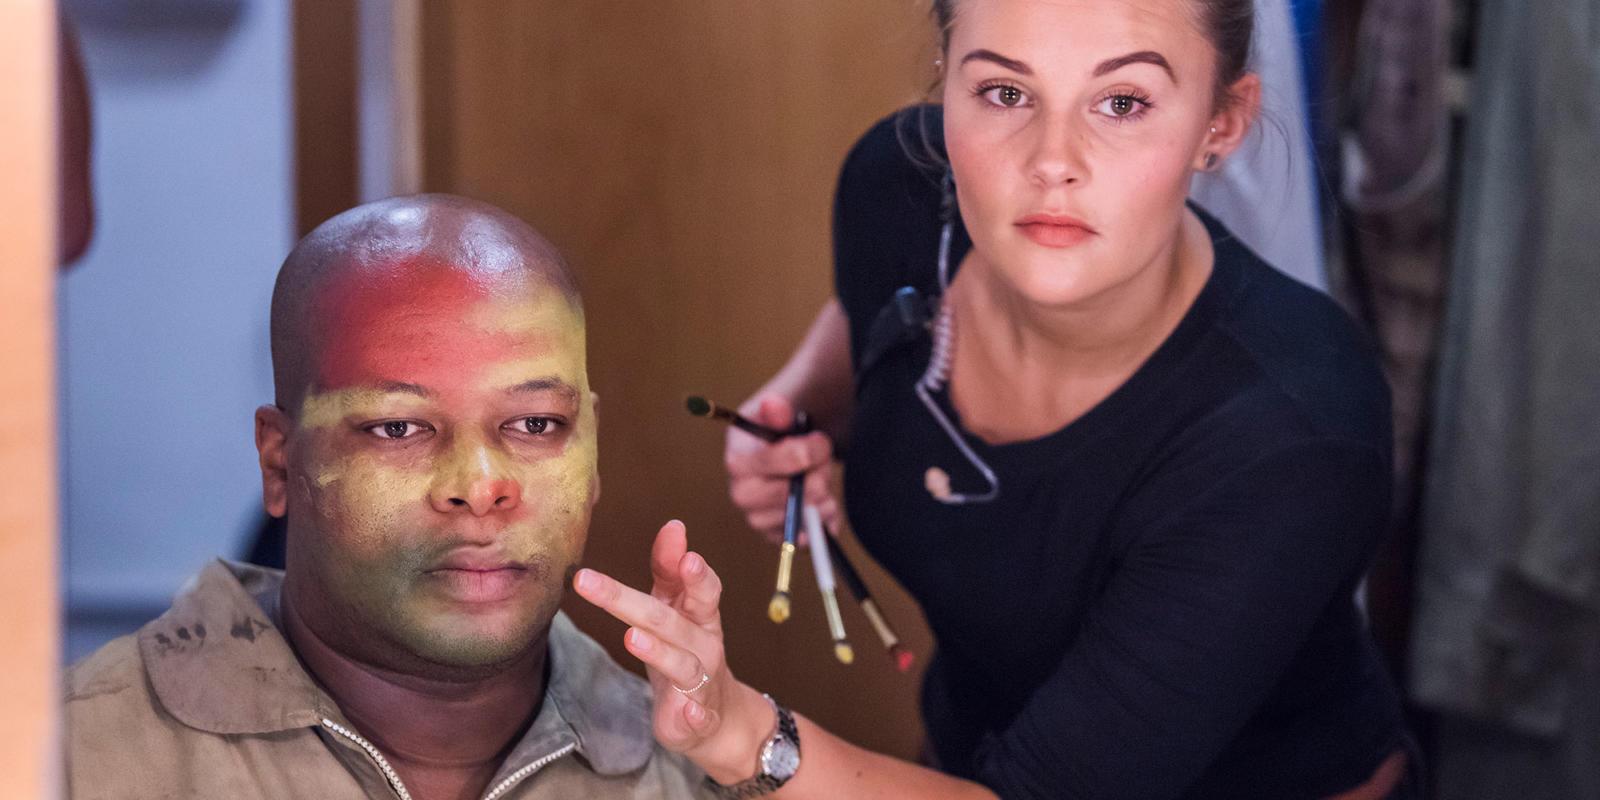 Musa Ngqungwana, who sings as war-king, Amonasro, has his war paint applied by makeup artist Taylor Rands (c) Tristam Kenton